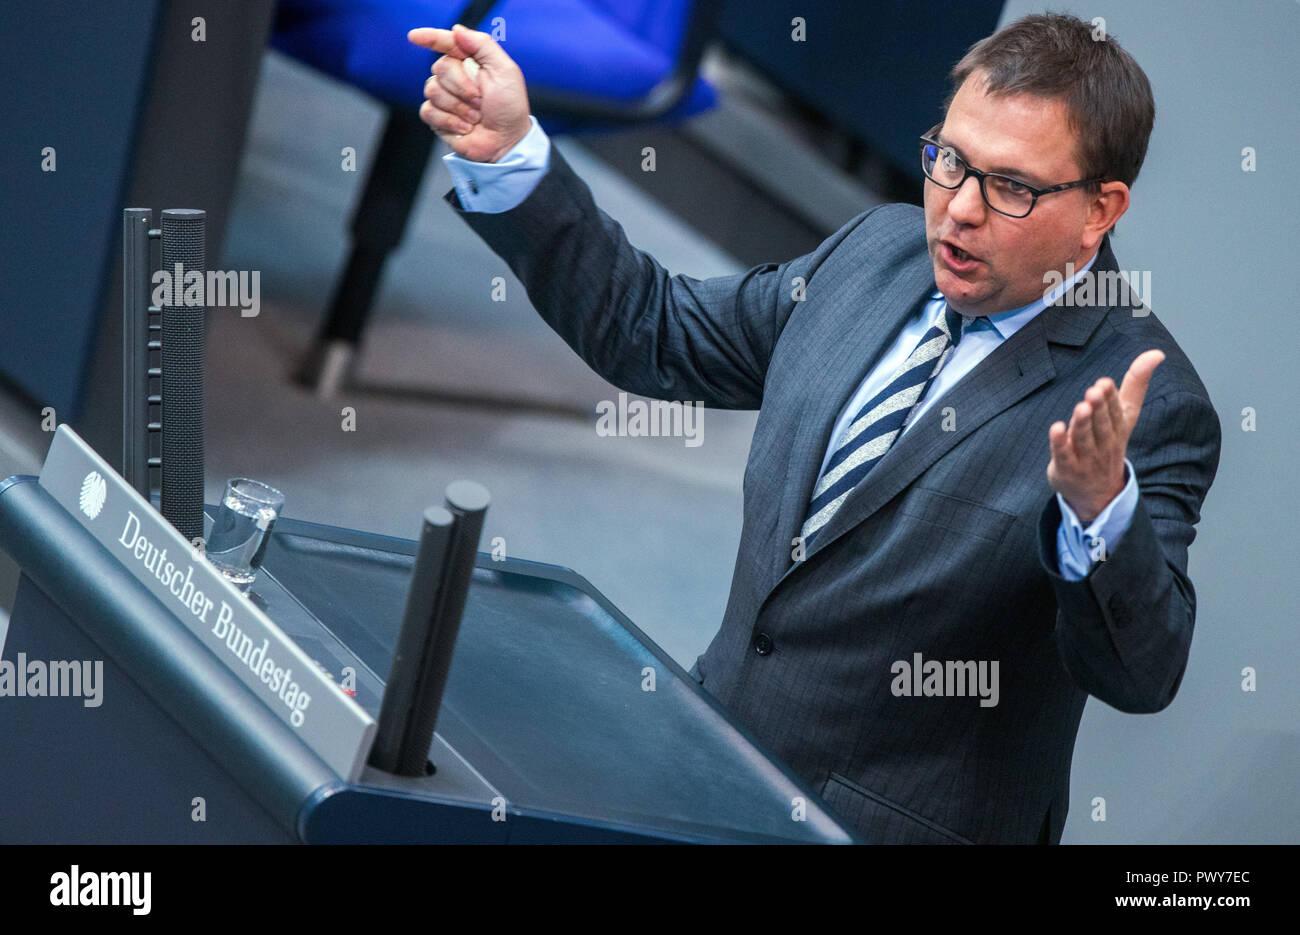 Berlin, Germany. 18th Oct, 2018. Stefan Ruppert, member of the Bundestag of the FDP faction, speaks in the Bundestag. Credit: Jens Büttner/dpa-Zentralbild/dpa/Alamy Live News - Stock Image